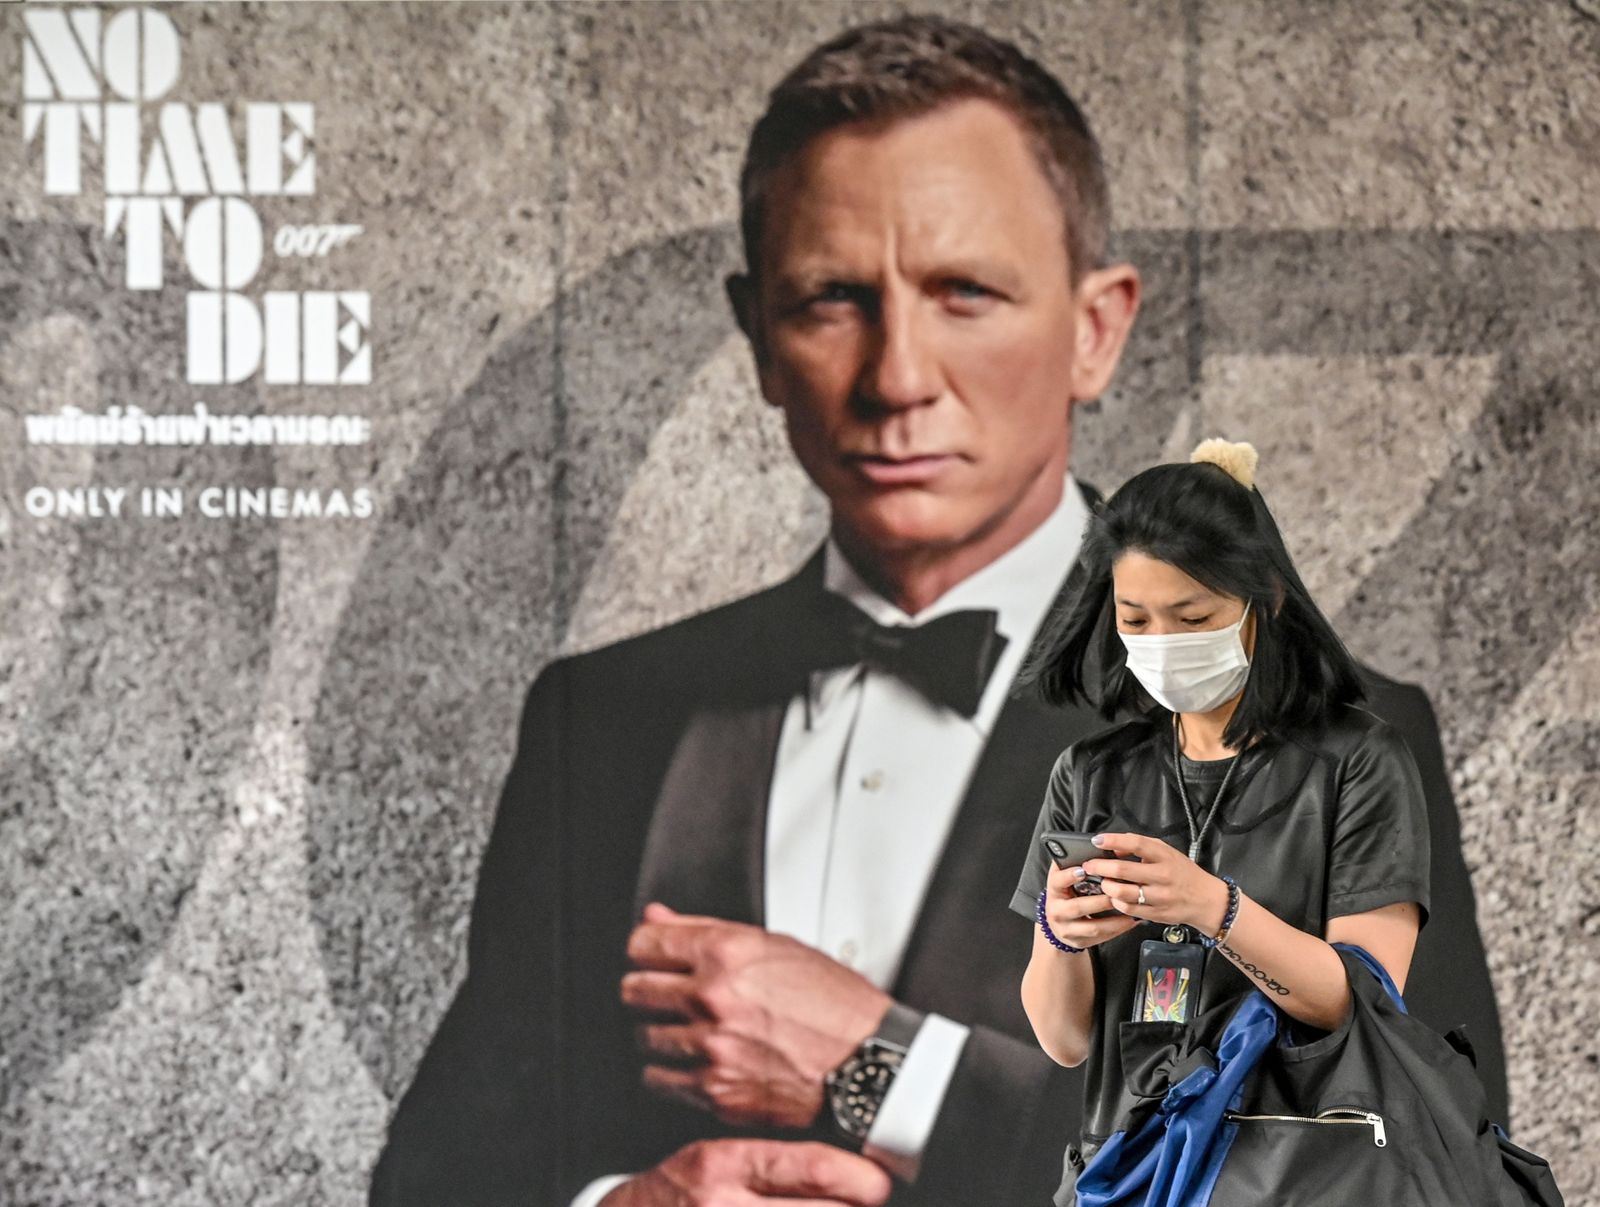 FILES-THAILAND-US-ENTERTAINMENT-FILM-BOLD-HEALTH-VIRUS